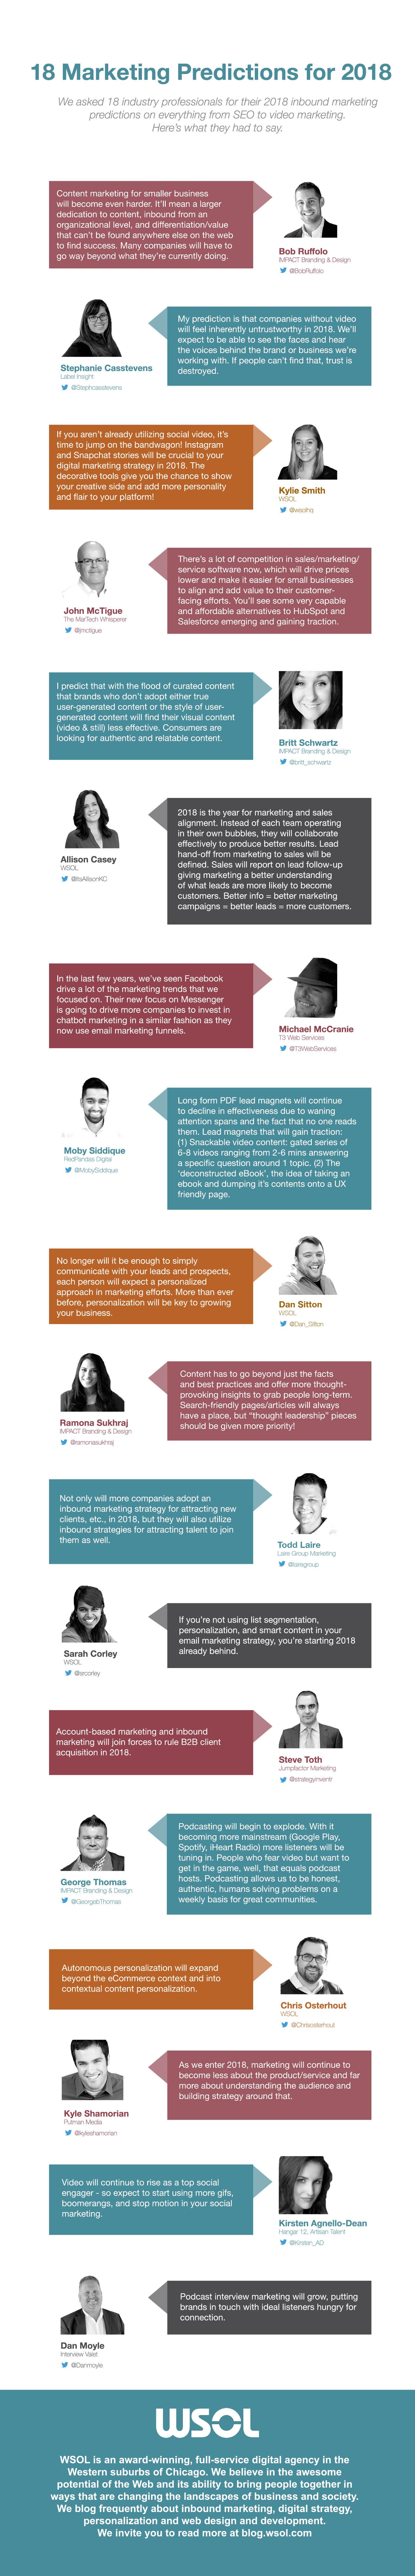 2018_Marketing_Predictions_WSOL.COM